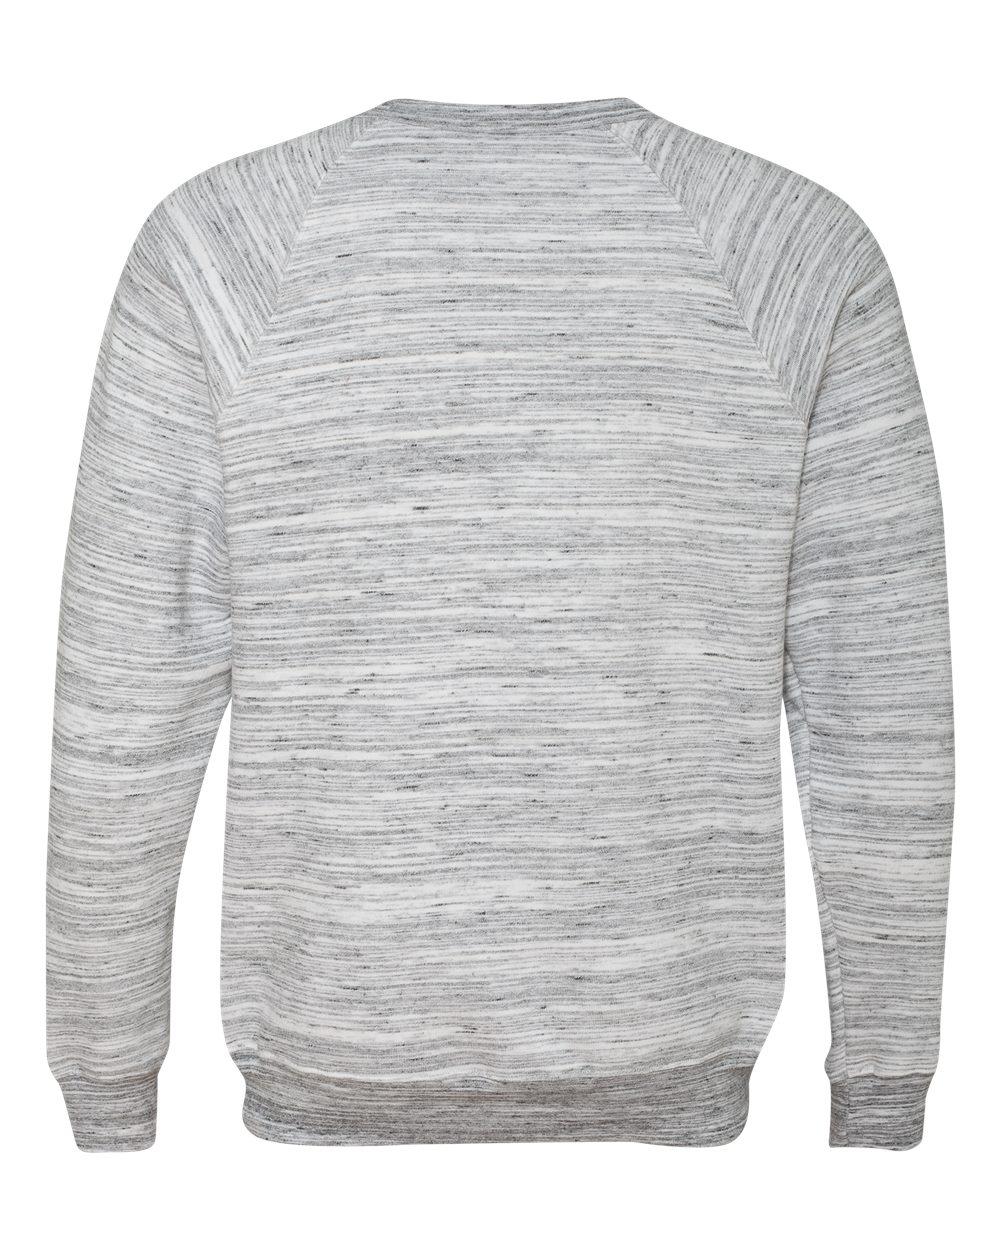 Bella-Canvas-Unisex-Sponge-Fleece-Crewneck-Sweatshirt-Top-Blank-3901-up-to-2XL thumbnail 44